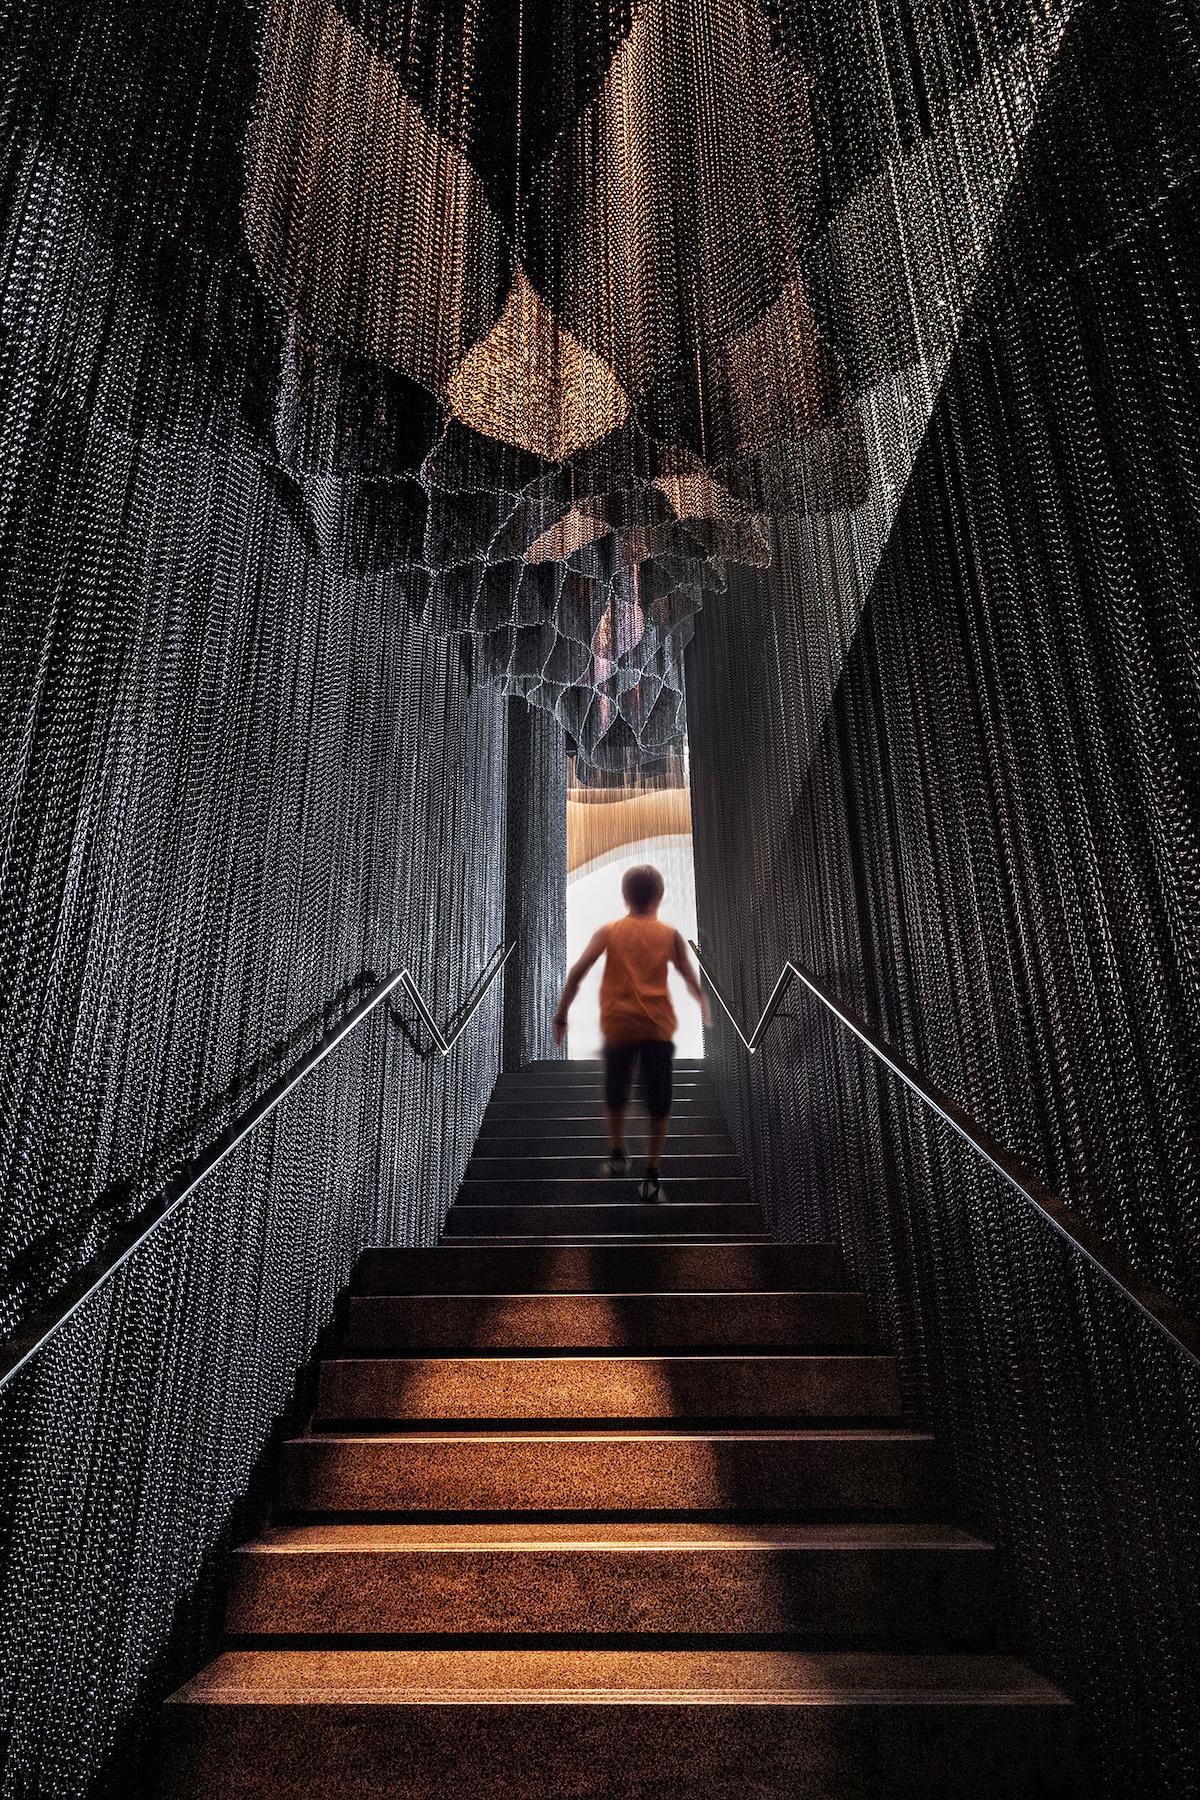 Person Walking Up Kengo Kuma Aluminum Chain Staircase in Gaudí's Casa Batlló, Captured by Jordi Anguera